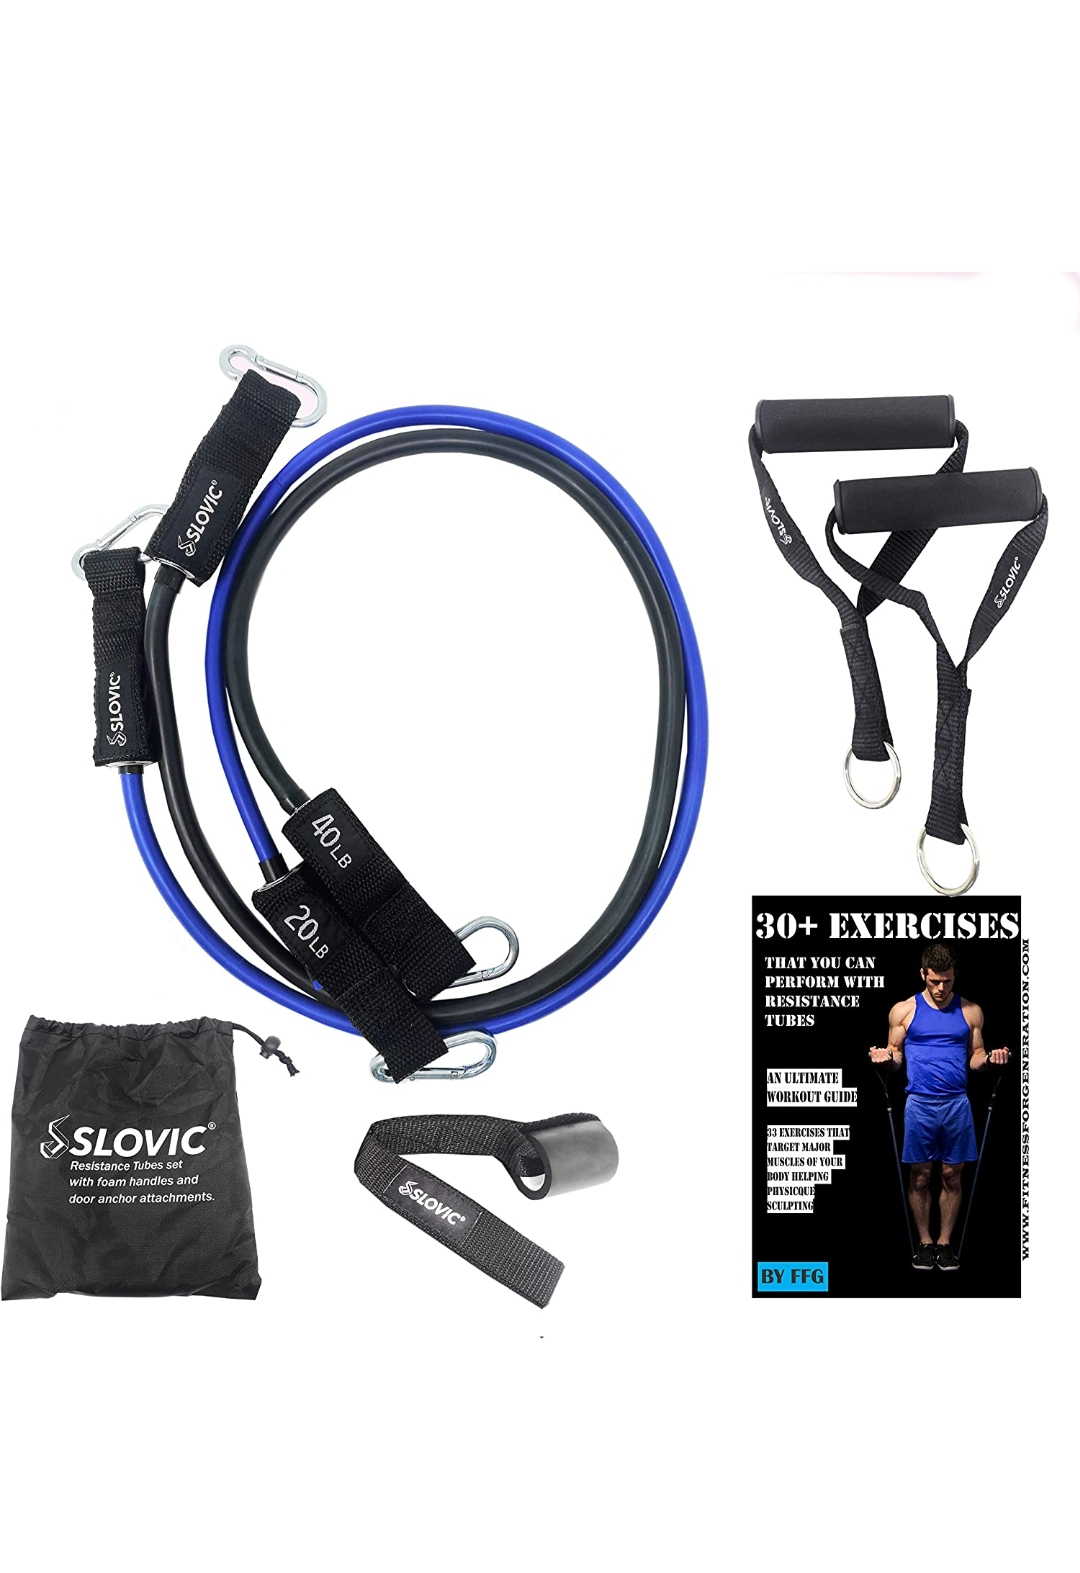 Slovic resistance band 60 lbs